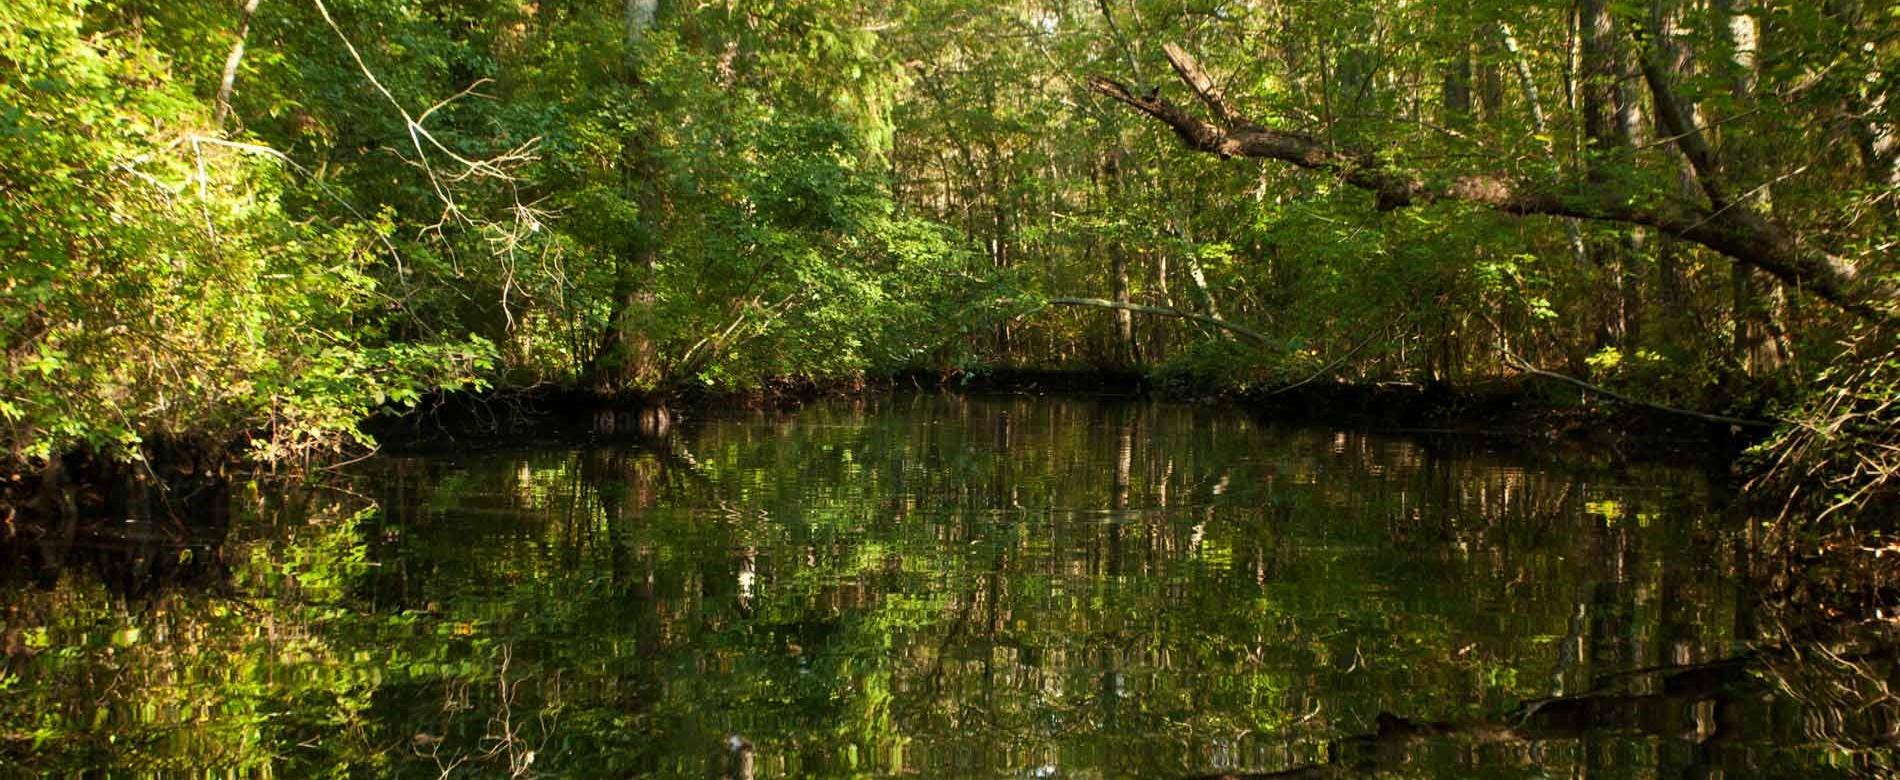 Pocomoke River State Forest